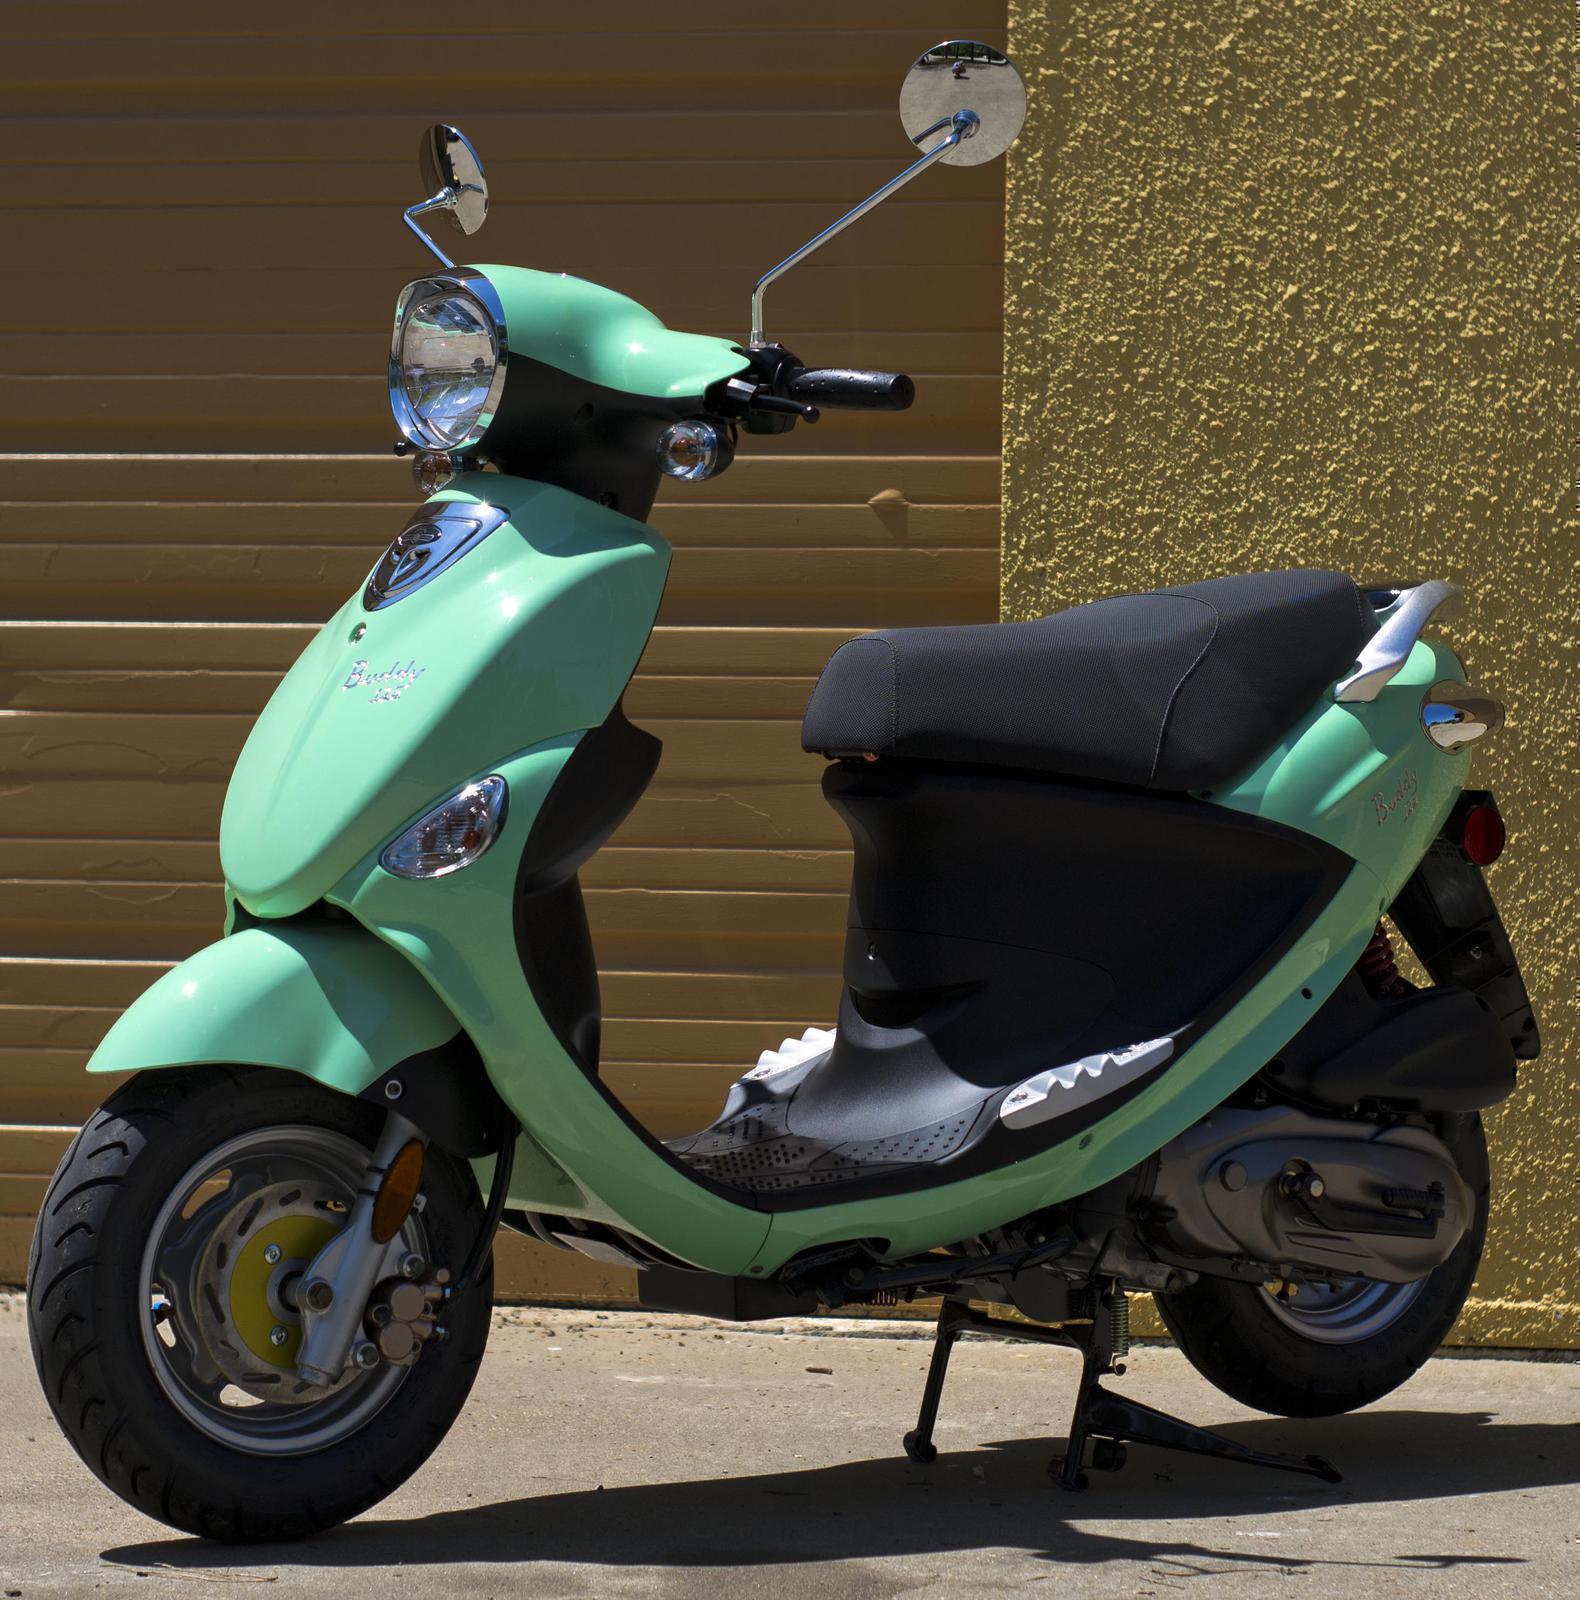 2018 Genuine Scooters Buddy 125 Seafoam